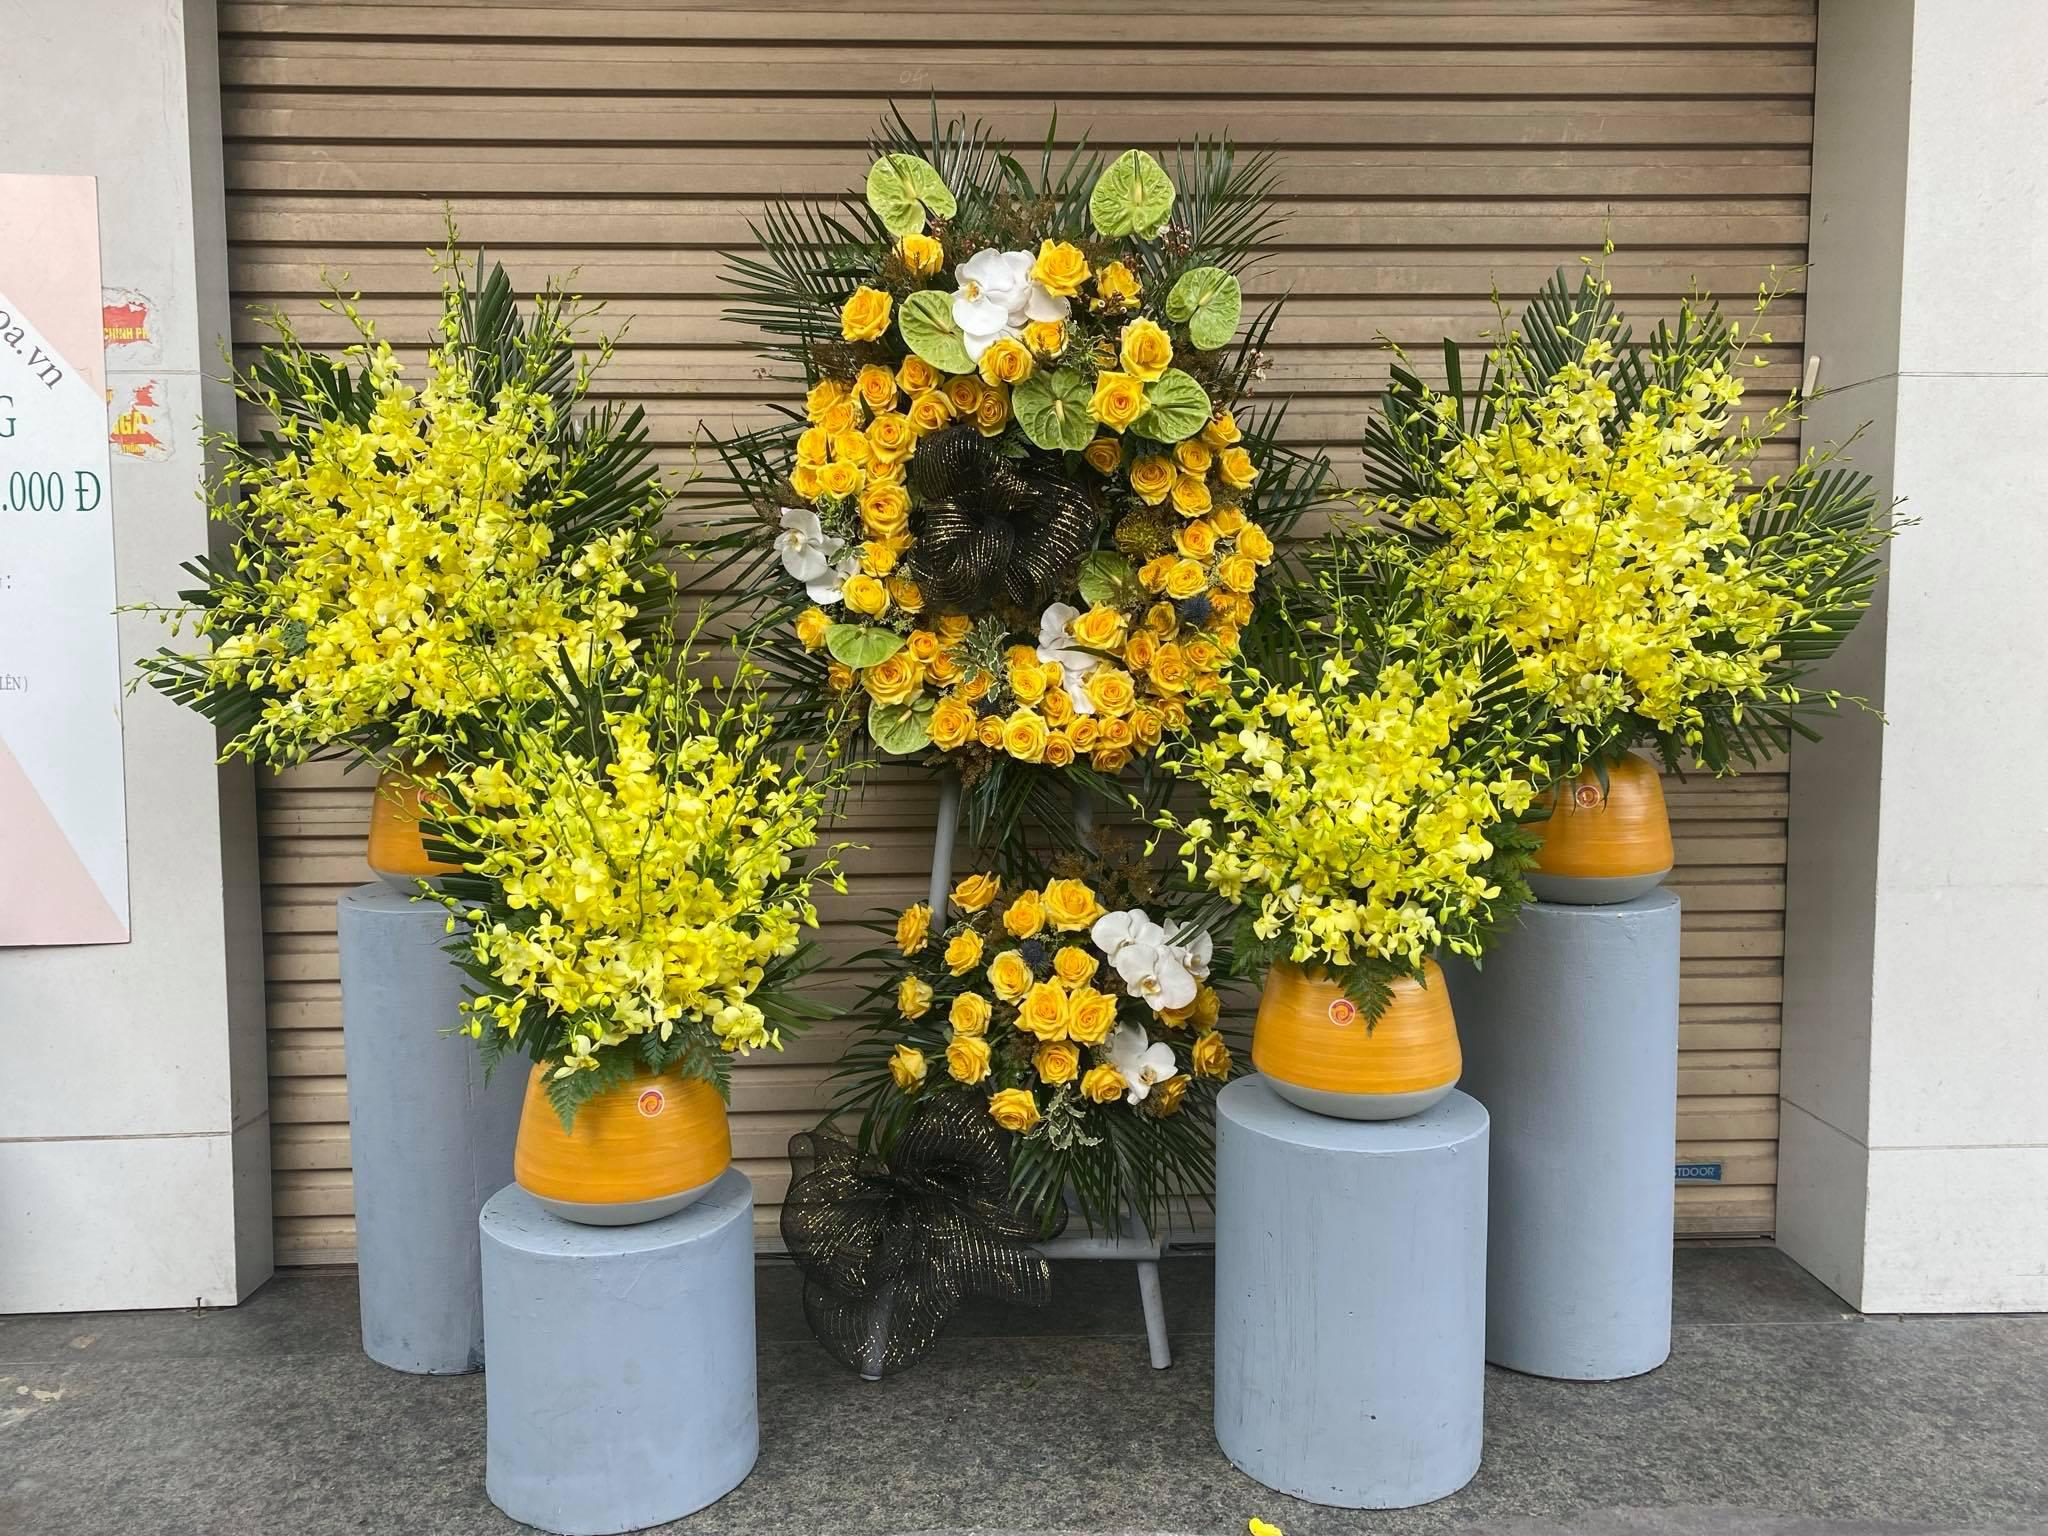 hoa chia buồn trọn gói